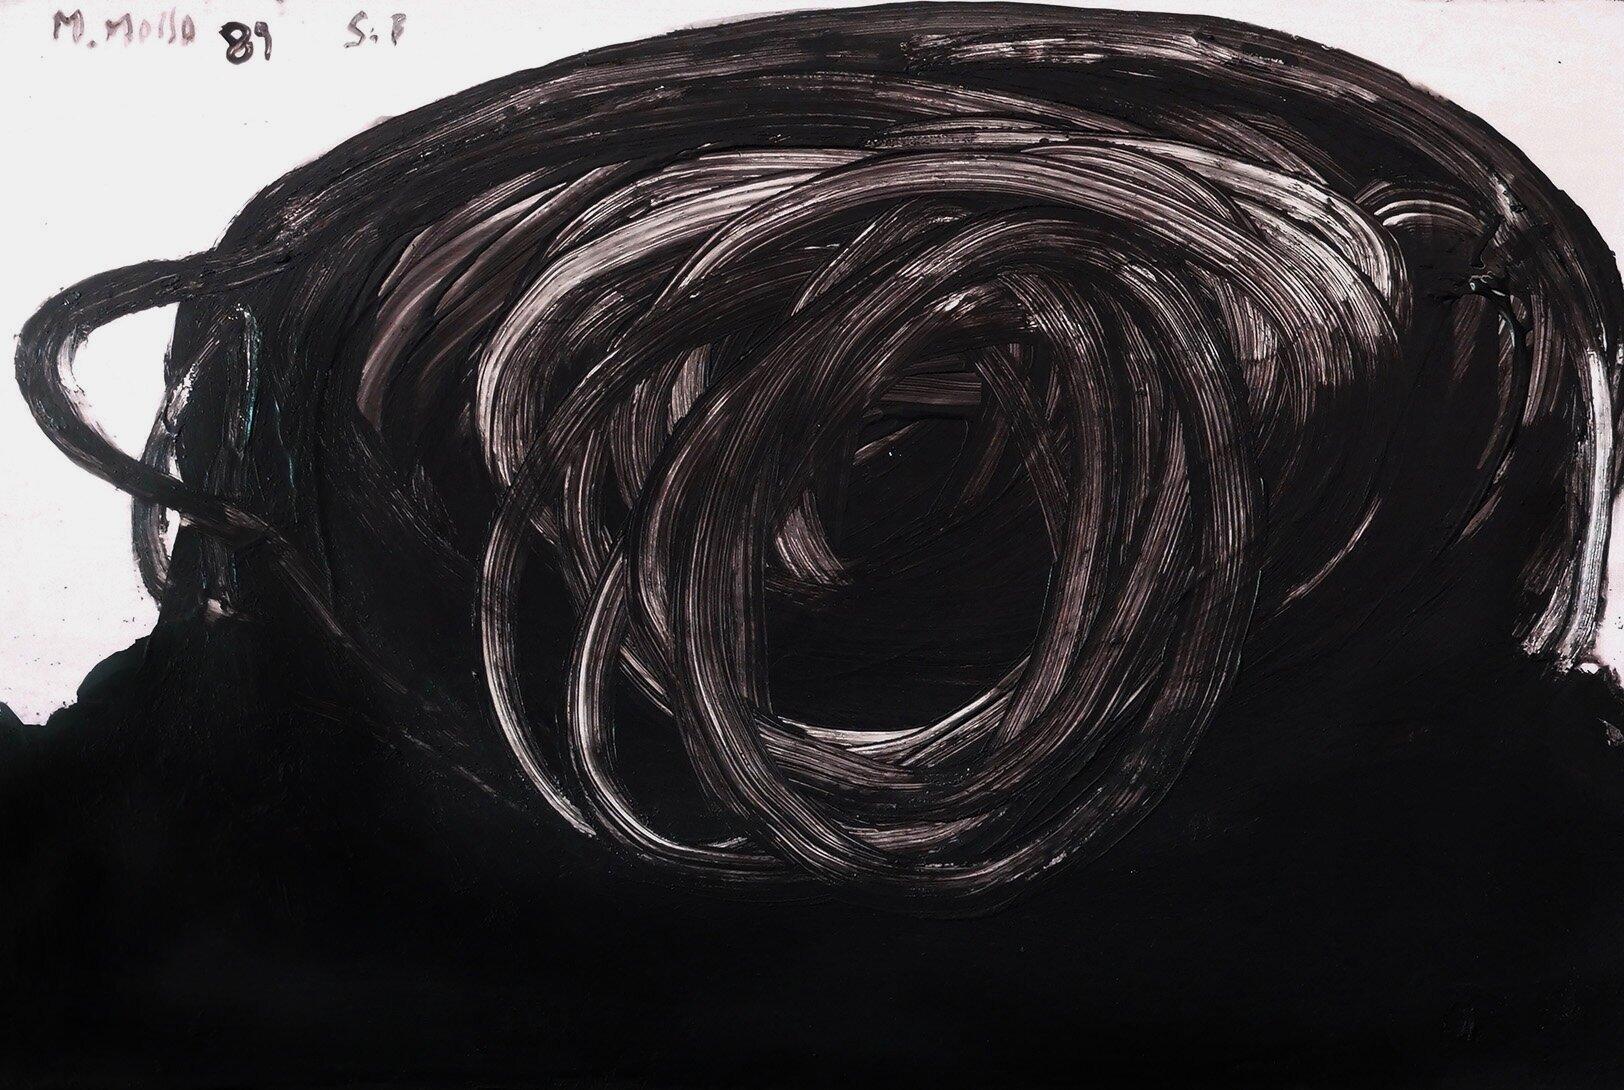 Virgilio Rospigliosi©Mare mosso d4. 1989. Cm 20x30, acrilico su tavola.jpg